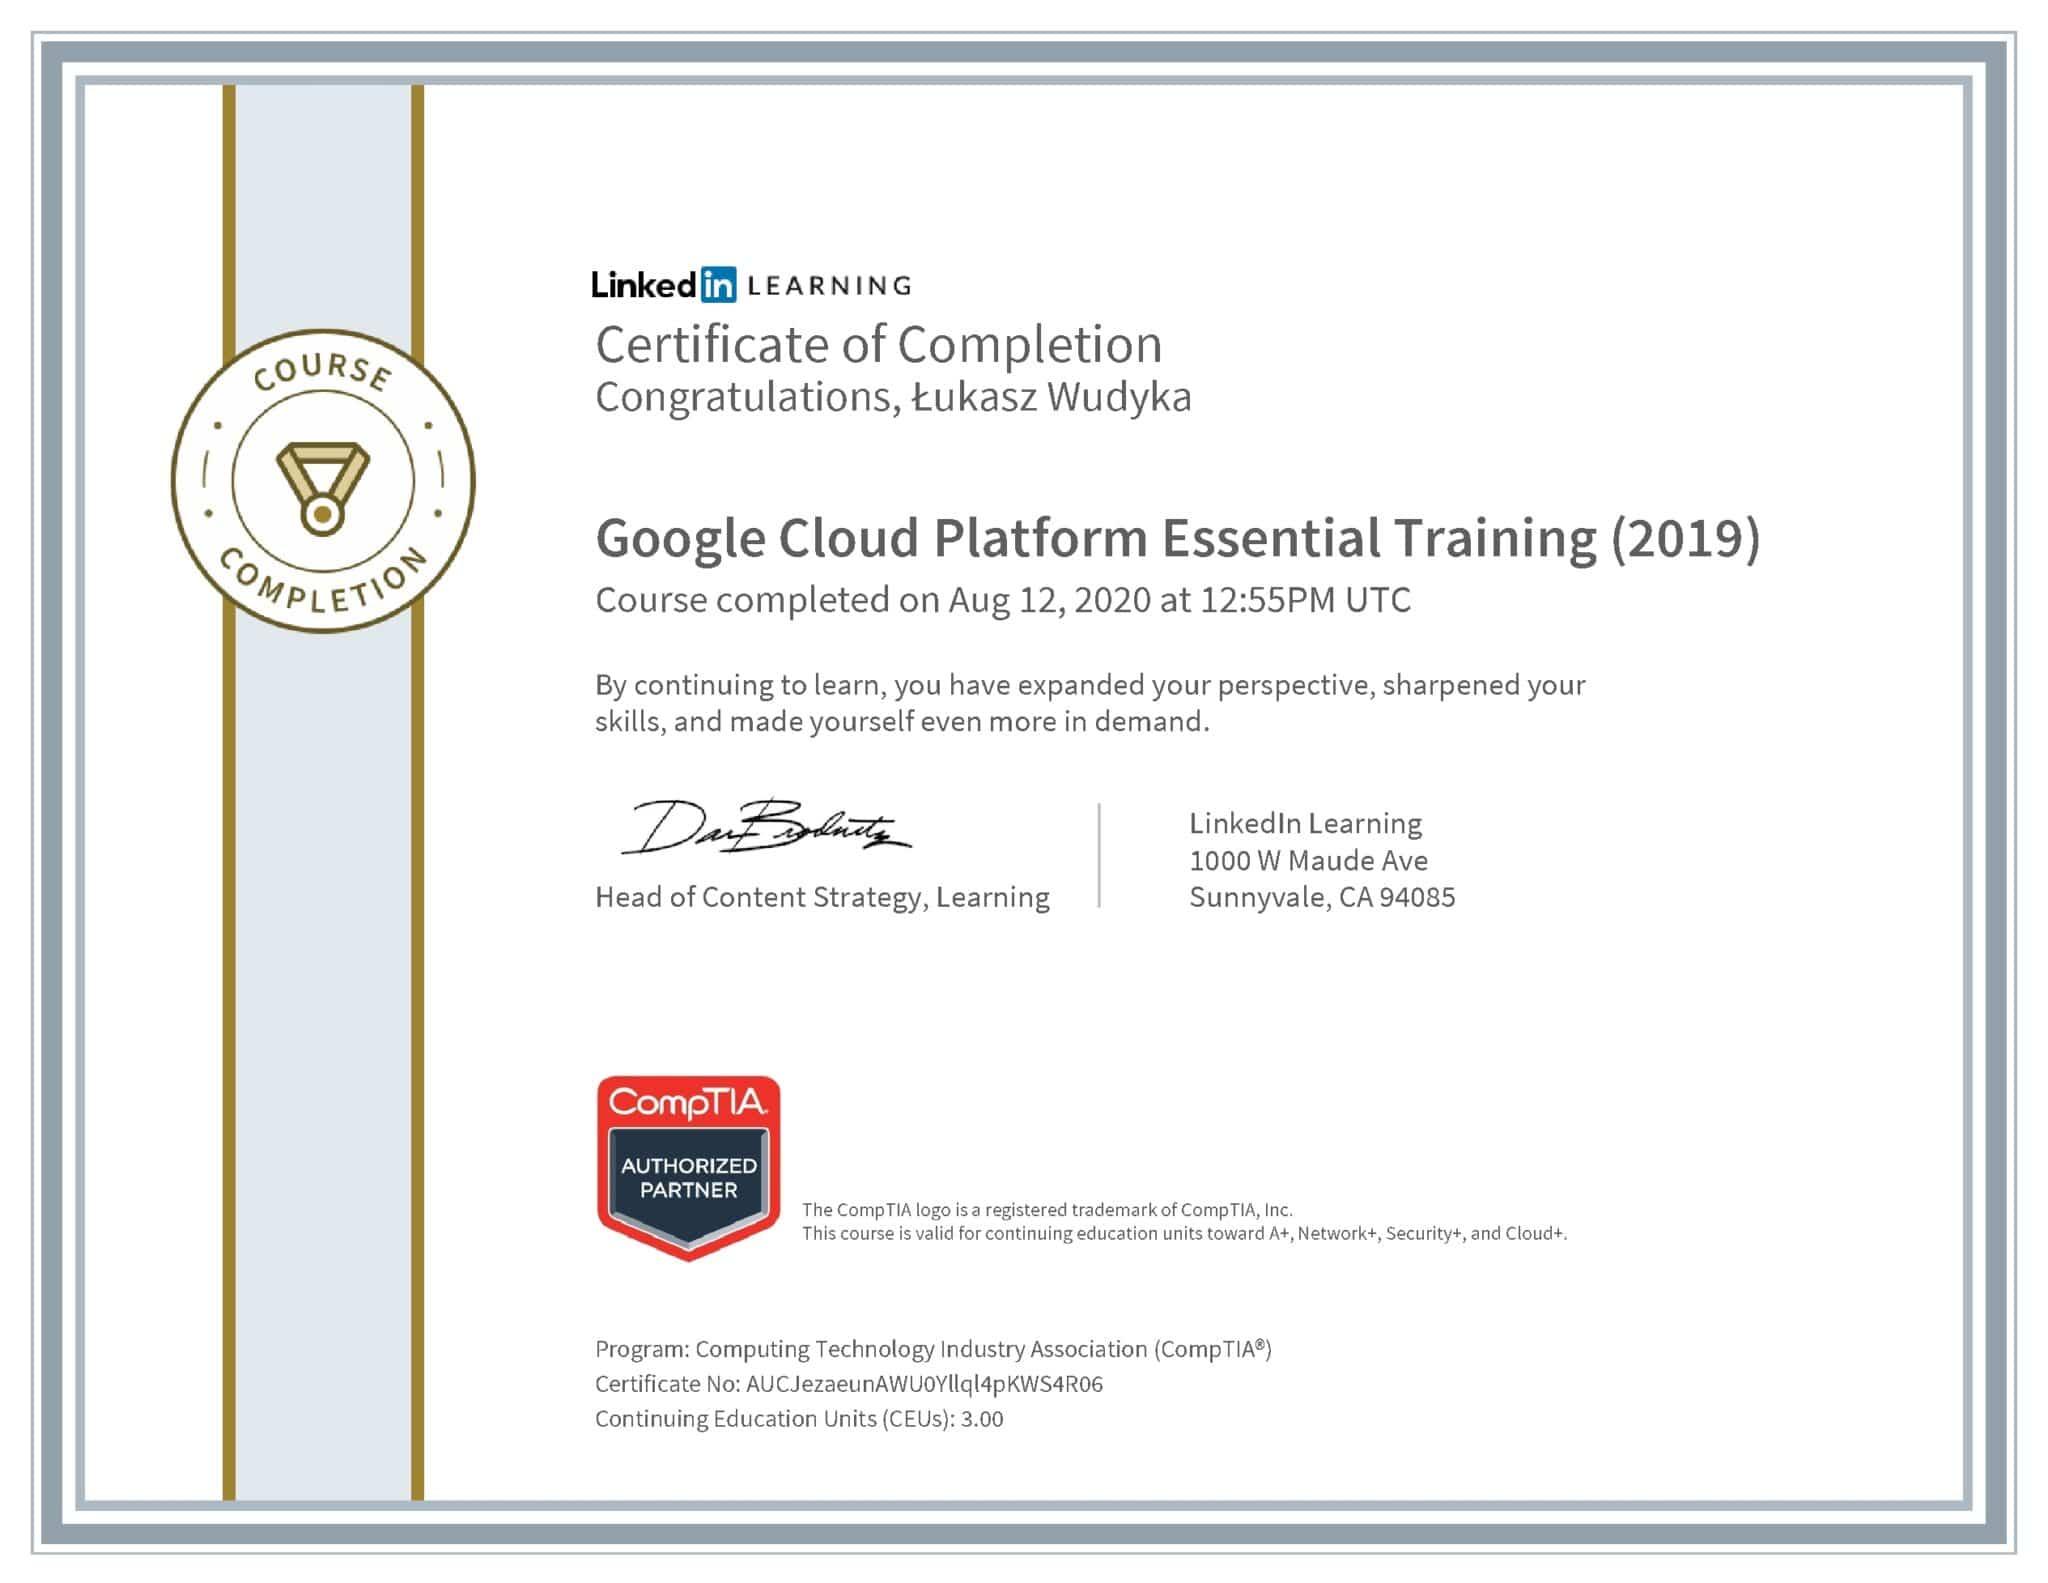 Łukasz Wudyka certyfikat LinkedIn Google Cloud Platform Essential Training (2019) CompTIA